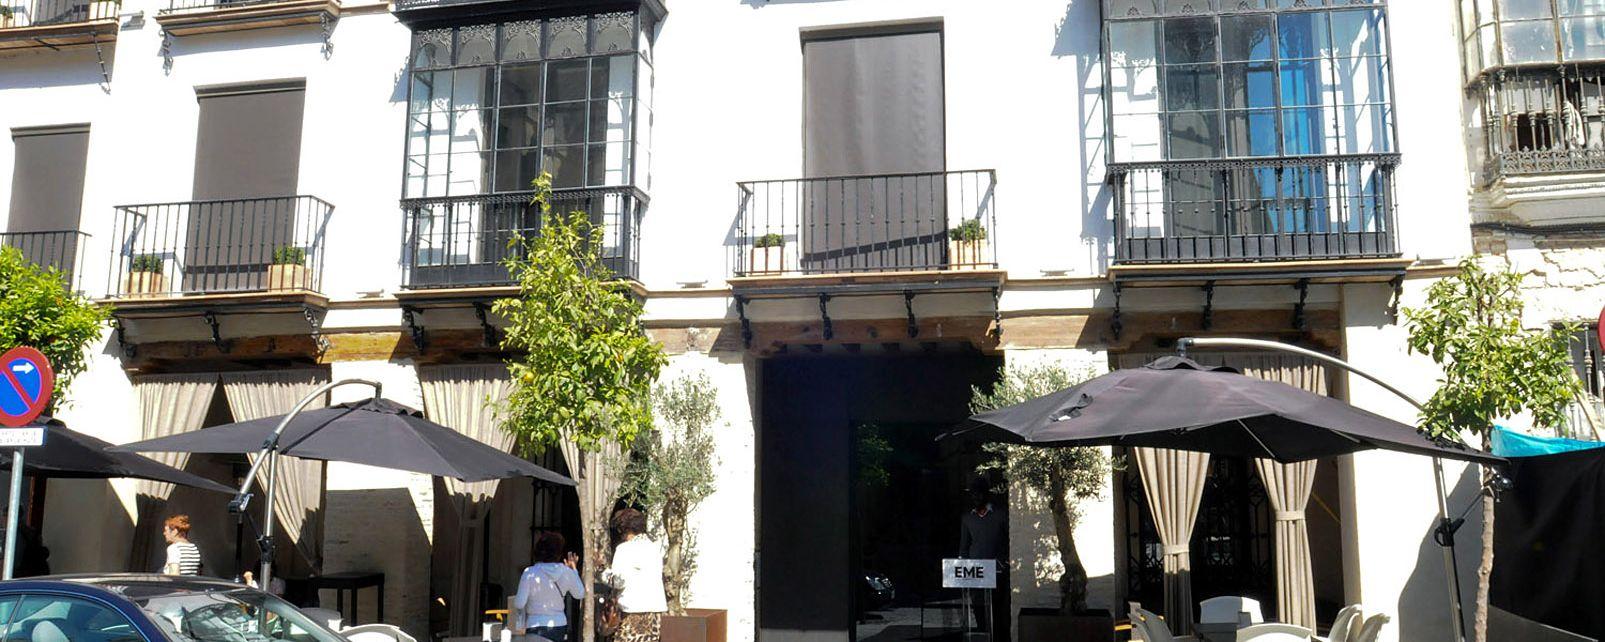 Hotel eme catedral in seville - Hotel eme sevilla spa ...